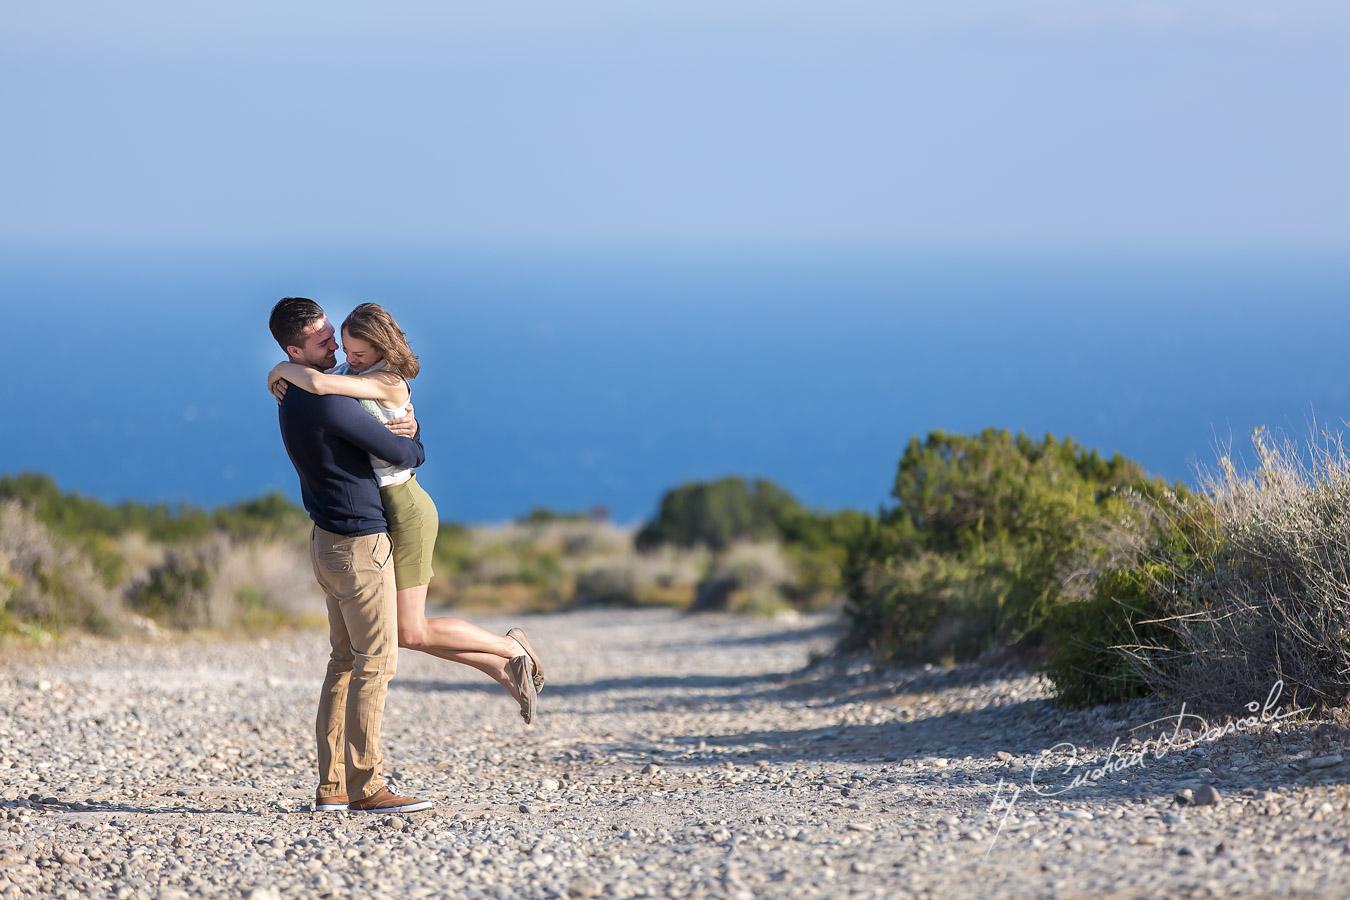 Love at first sight - Karen & Martins at Kurion Cyprus - 04